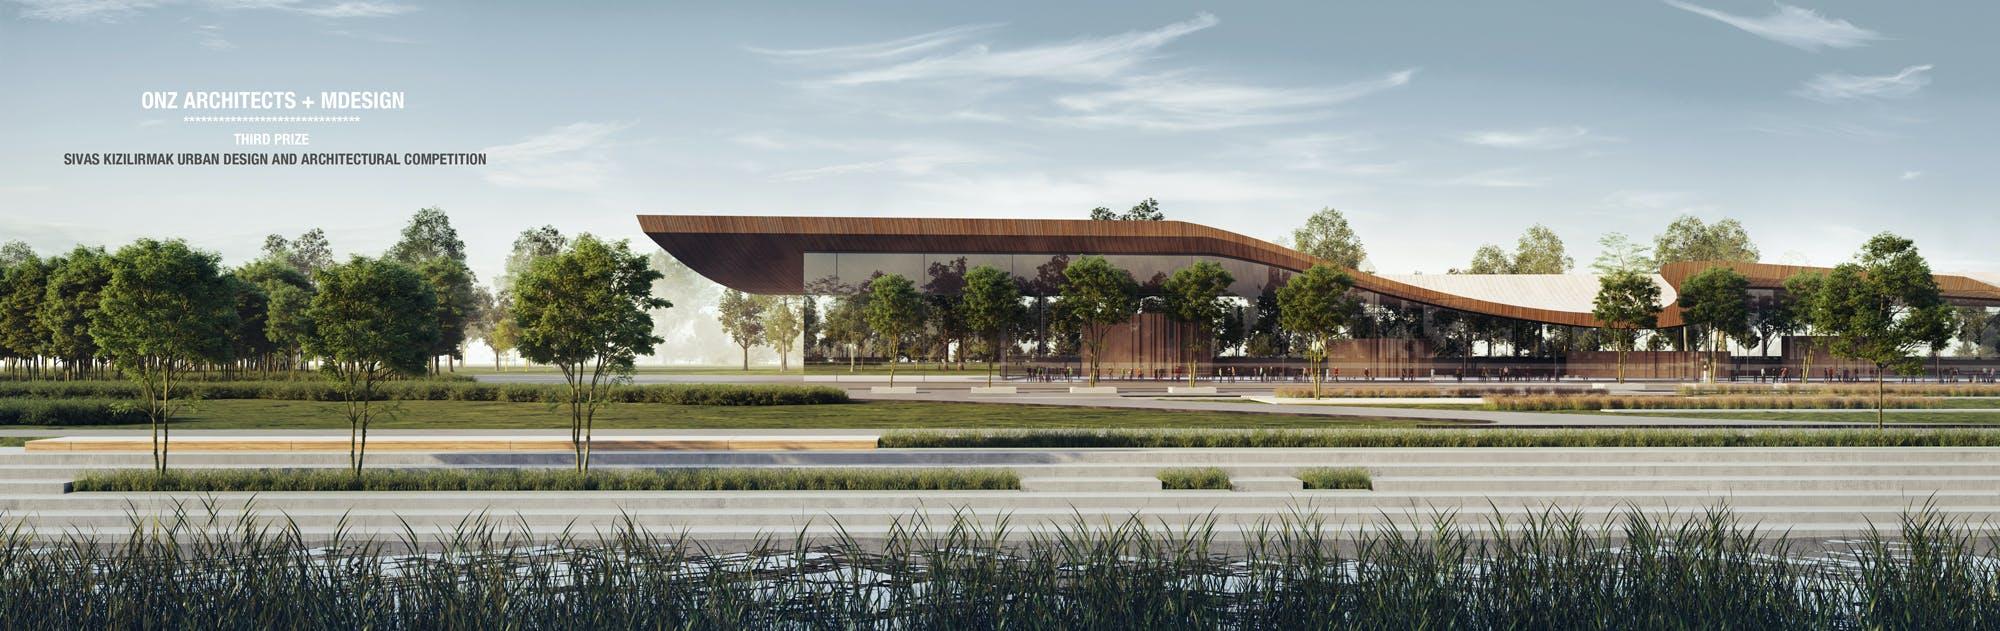 Onwijs ONZ Architecs + Mdesign won the 3rd Prize in Kızılırmak River Bank AC-07